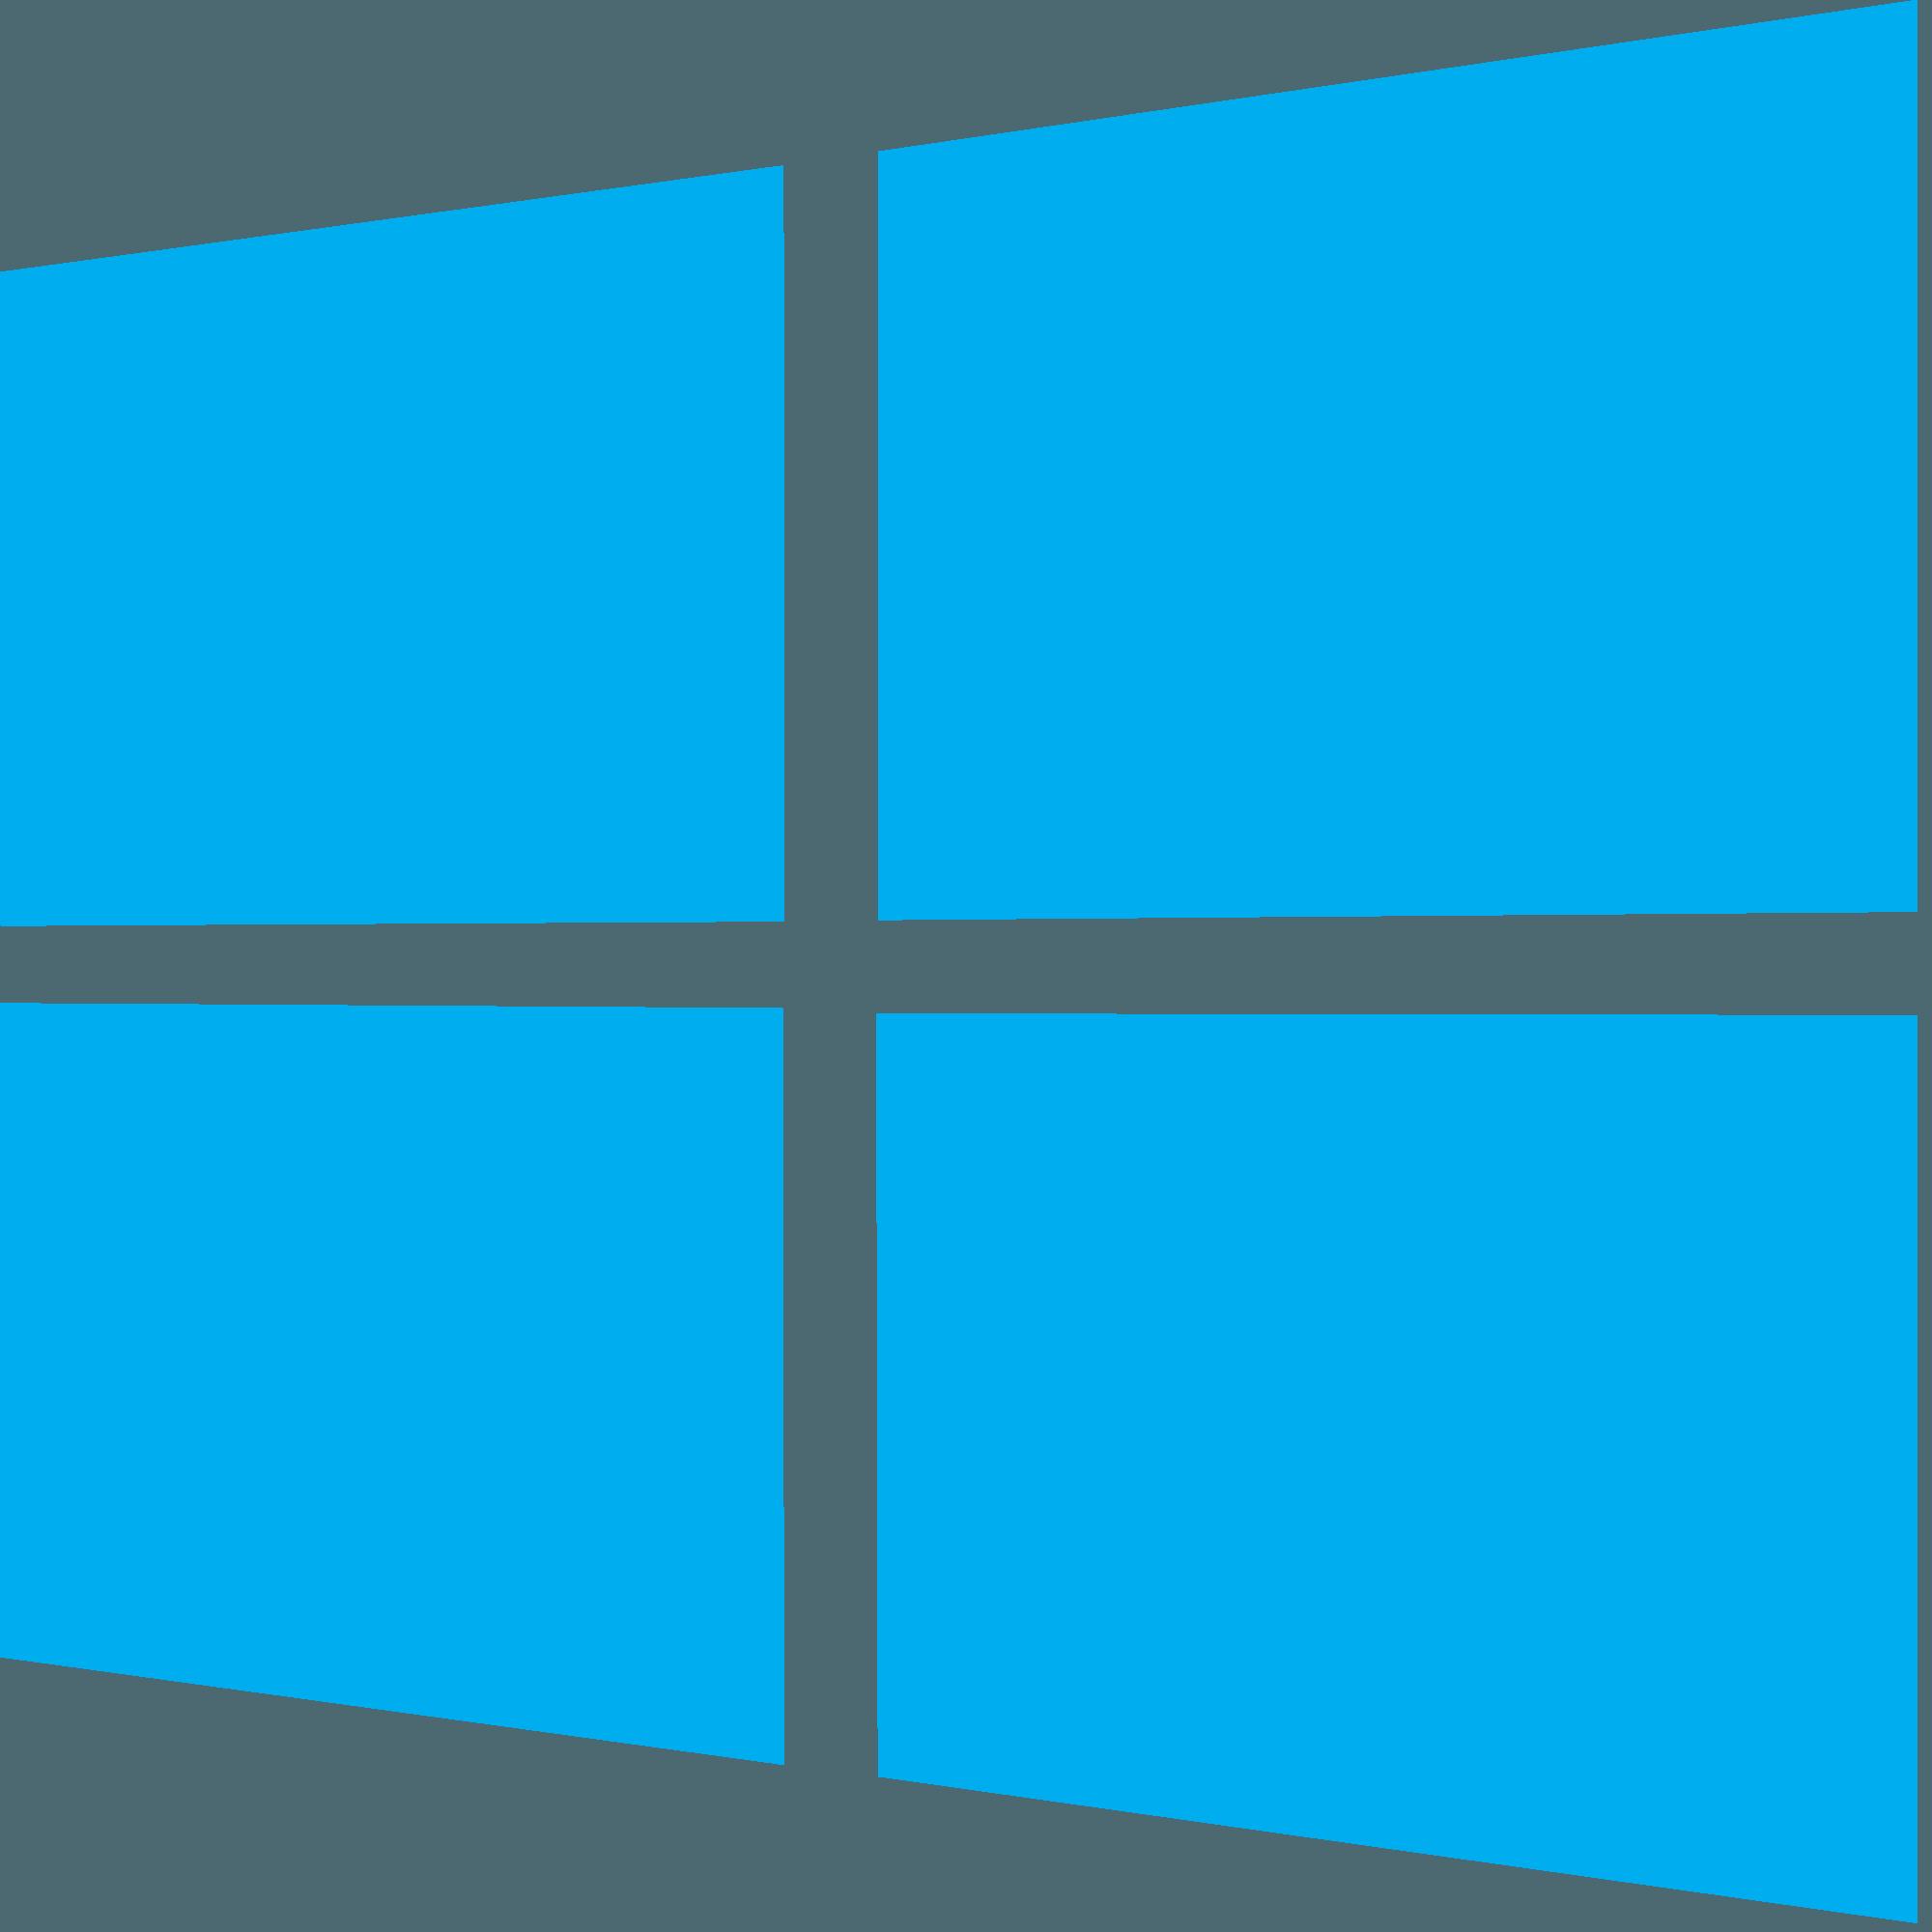 Windows10 логотип